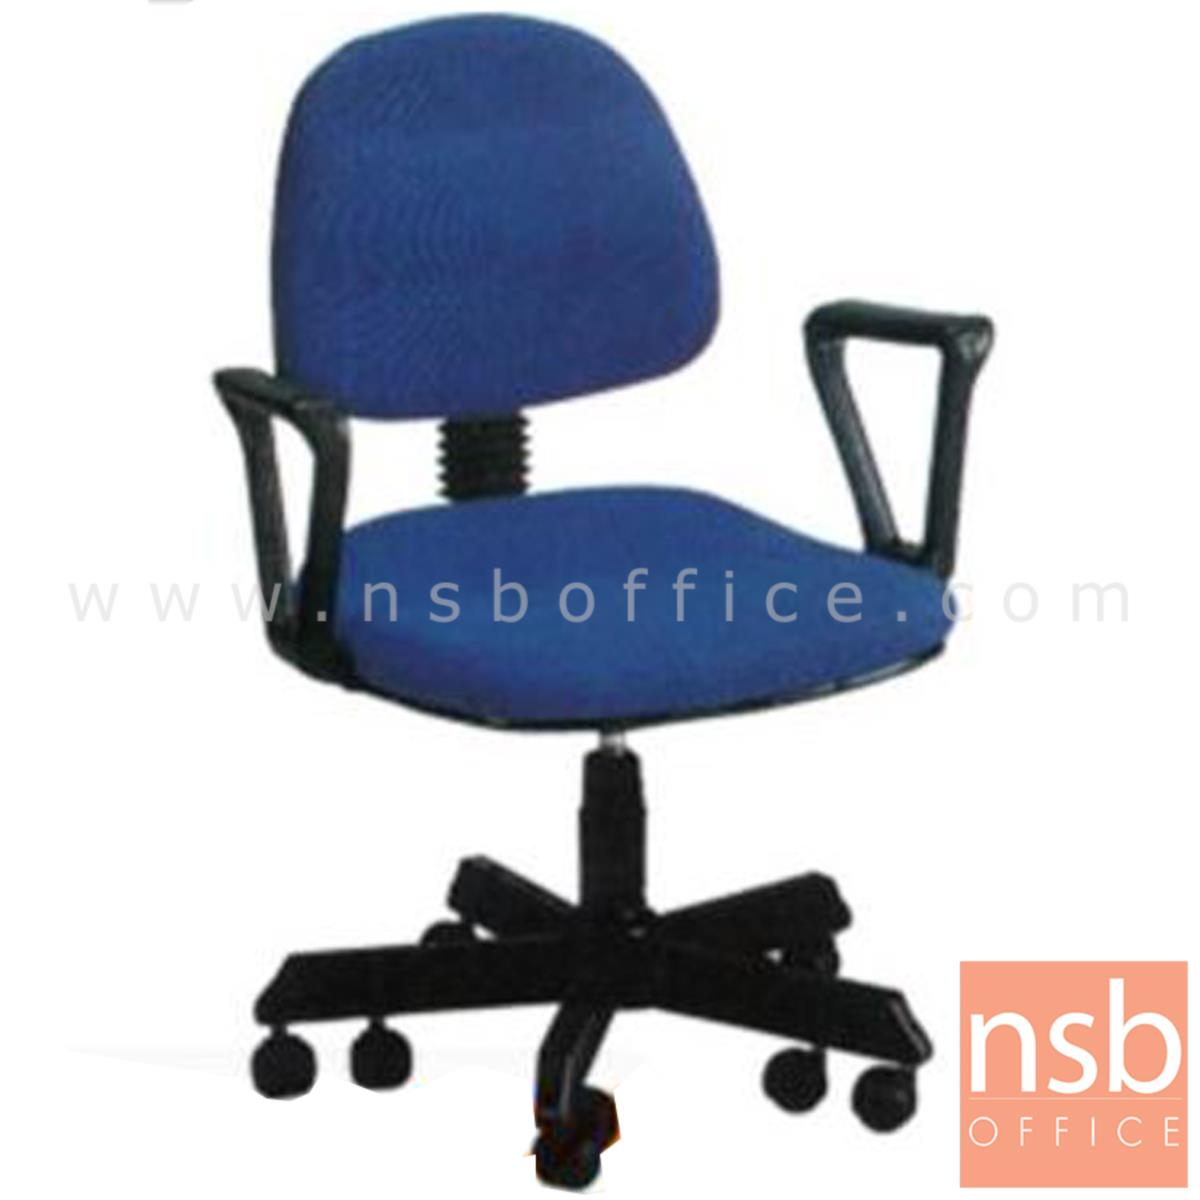 B14A022:เก้าอี้สำนักงาน รุ่น Lanter  ขาเหล็ก 10 ล้อ